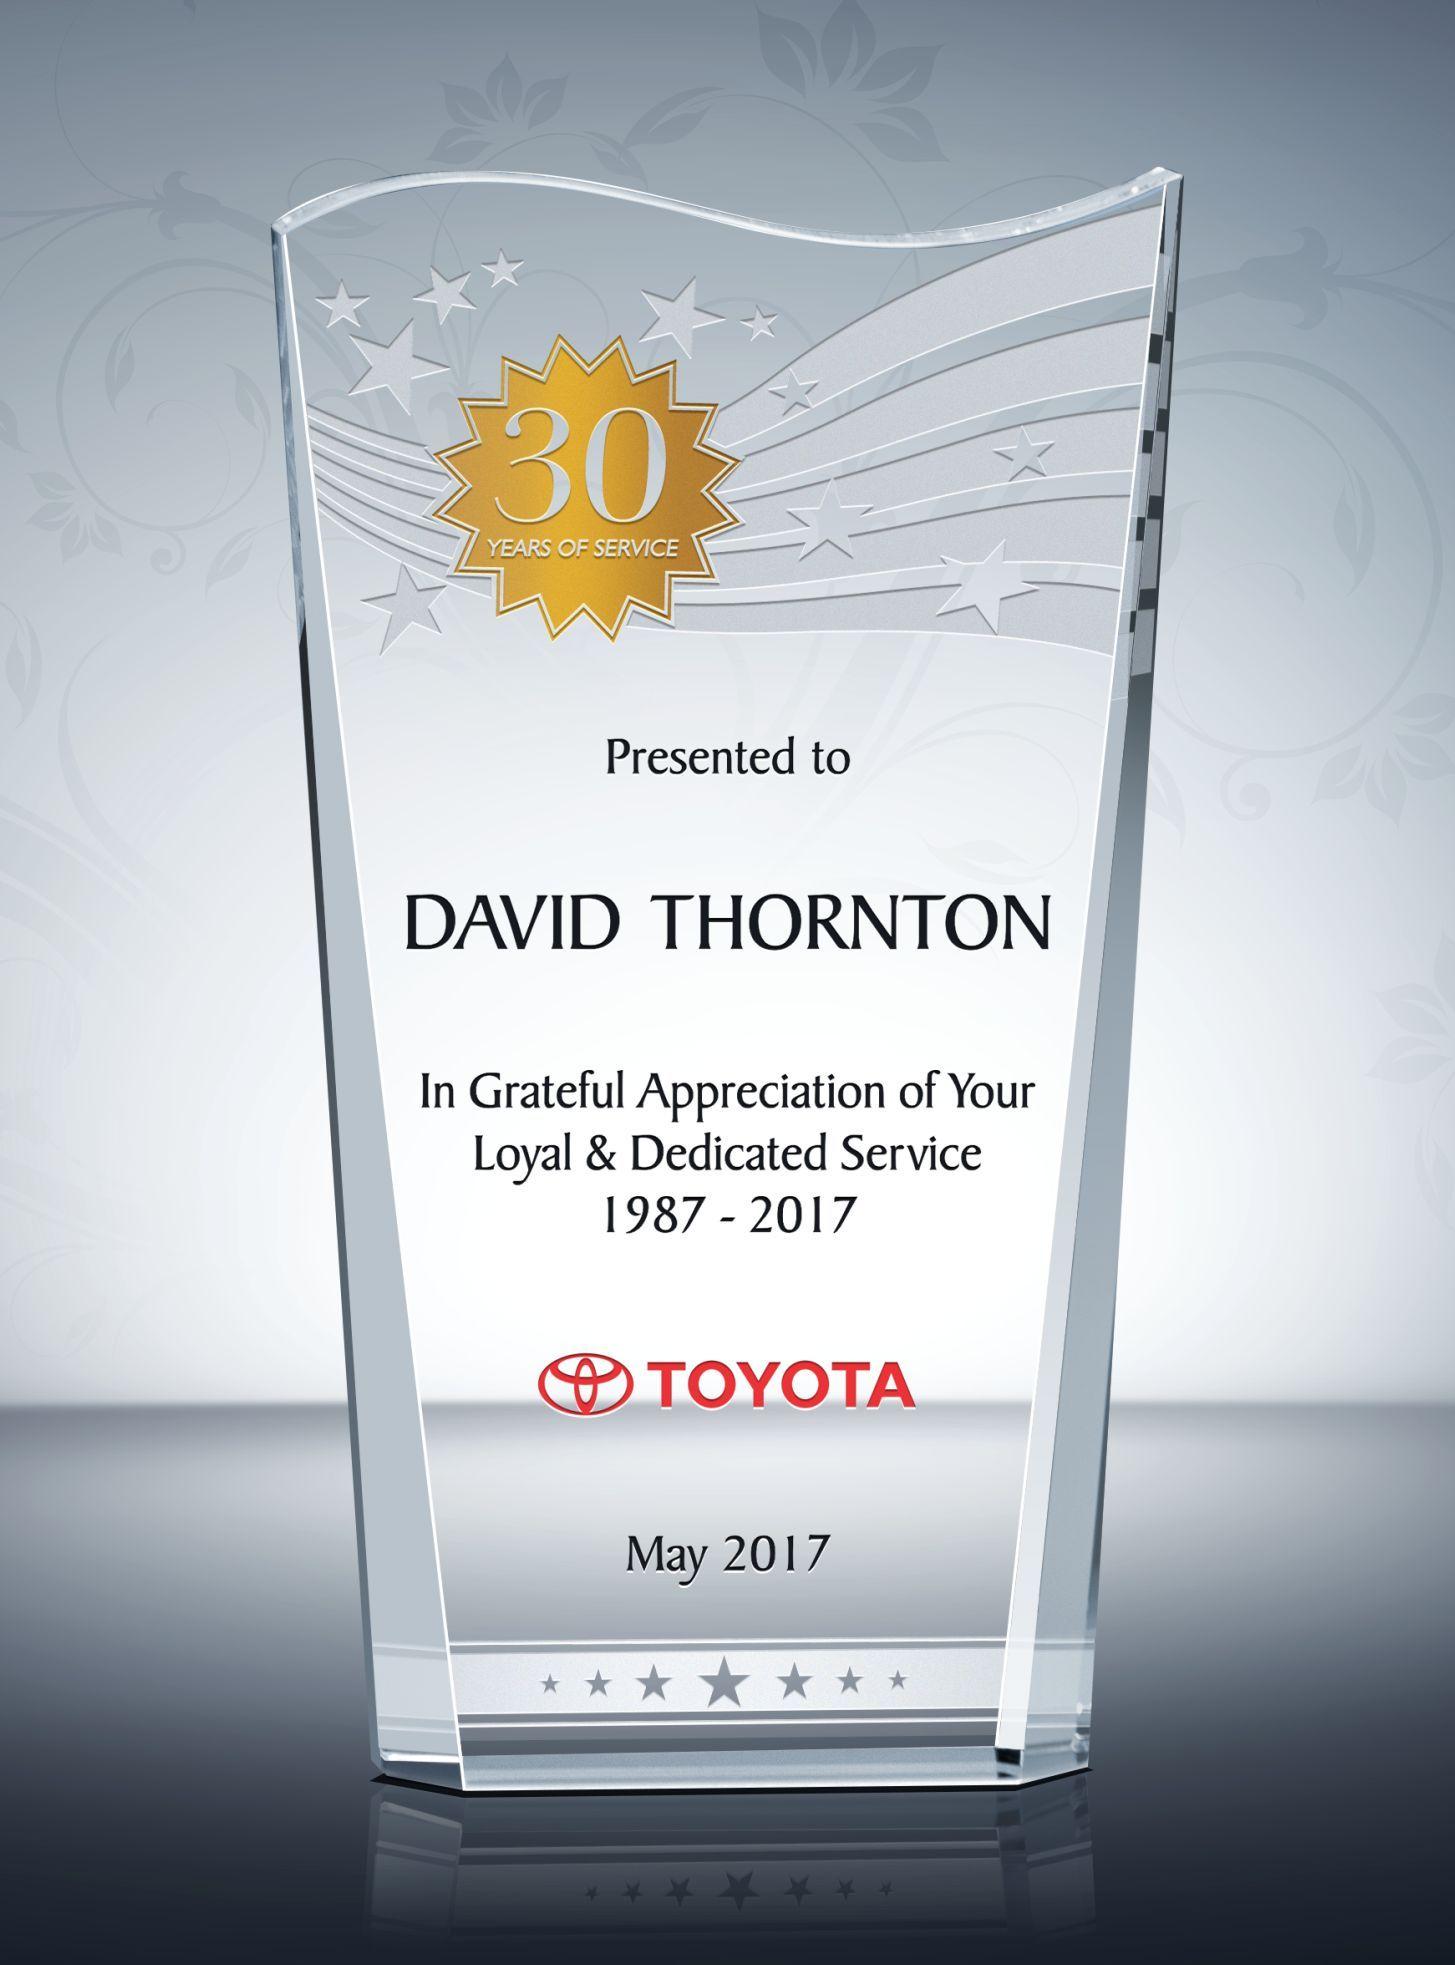 wave staff long service awards